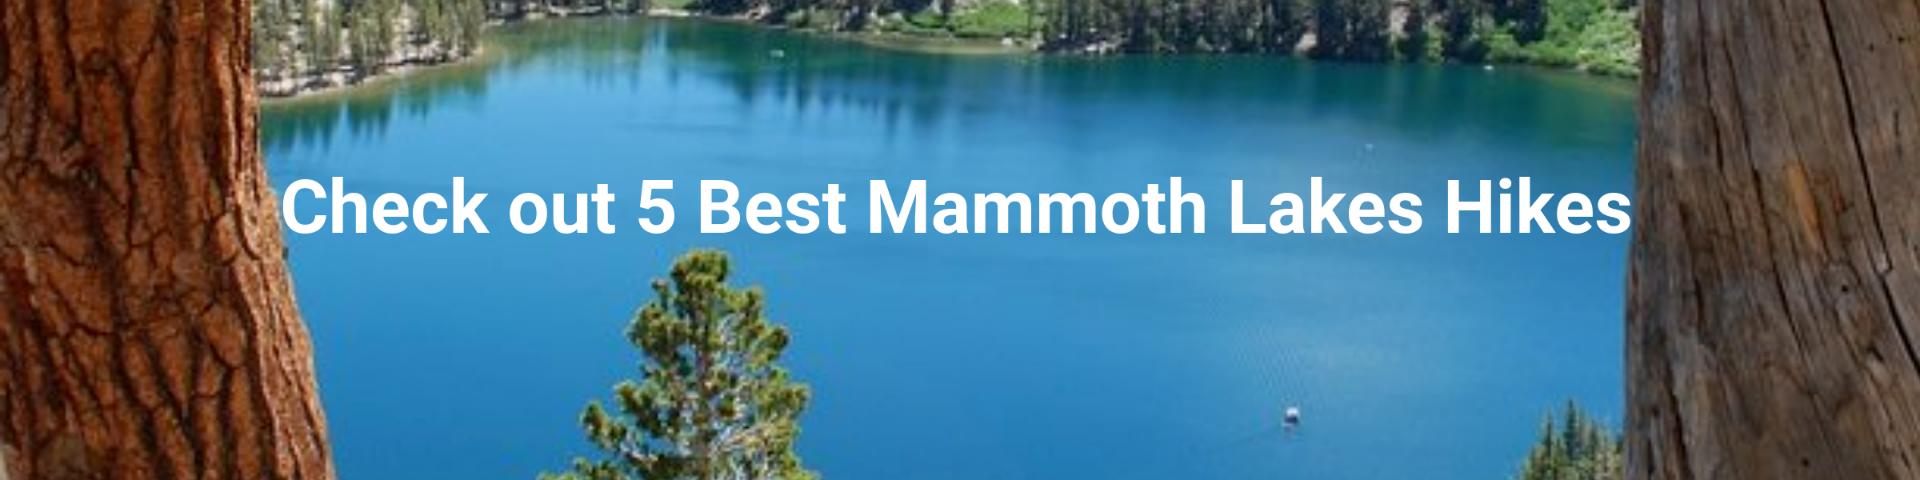 5 Favorite Mammoth Lakes Hikes